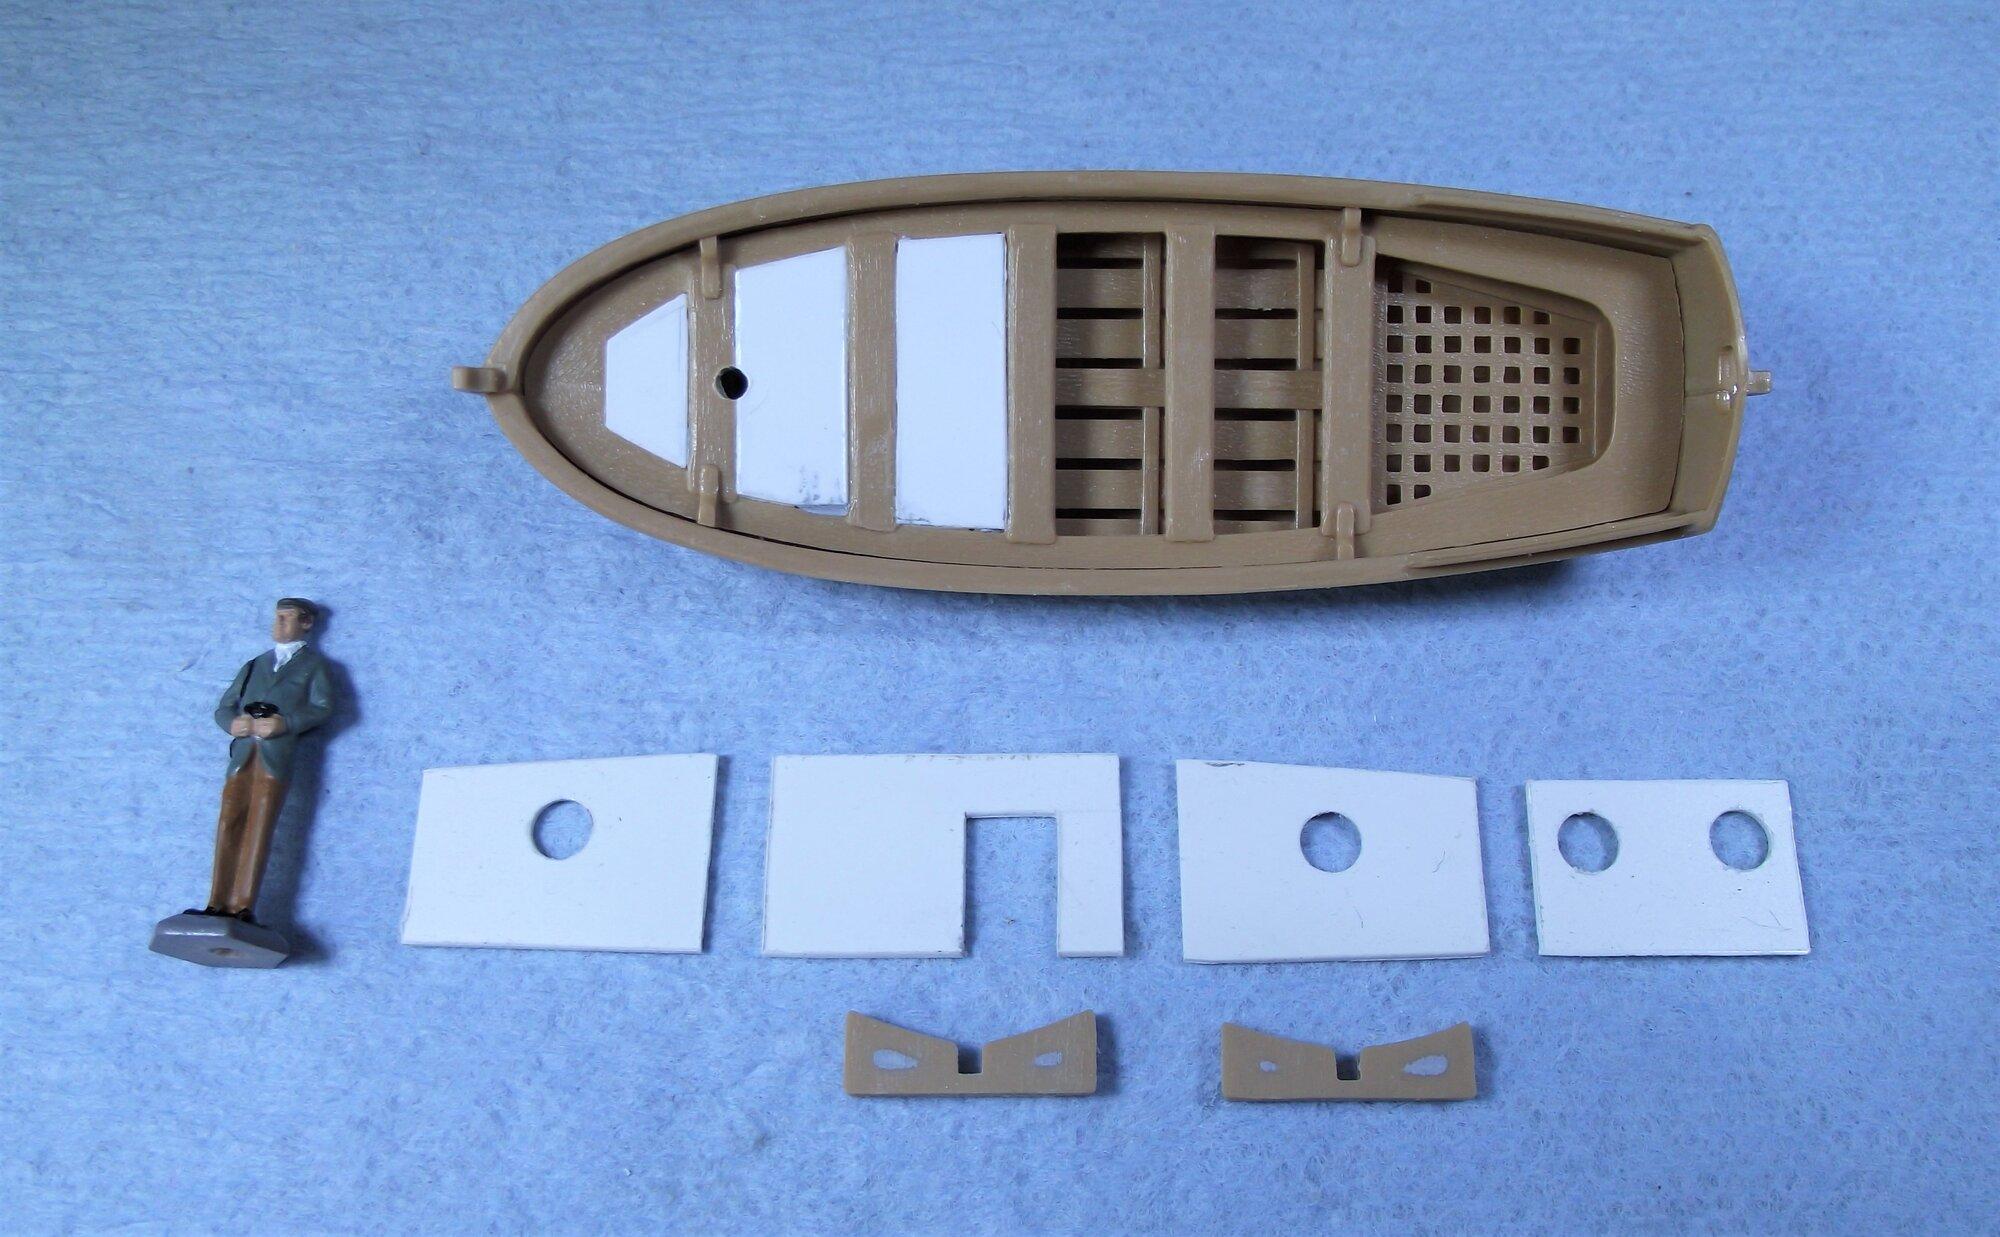 Boat_04-26-2021 (1).jpg